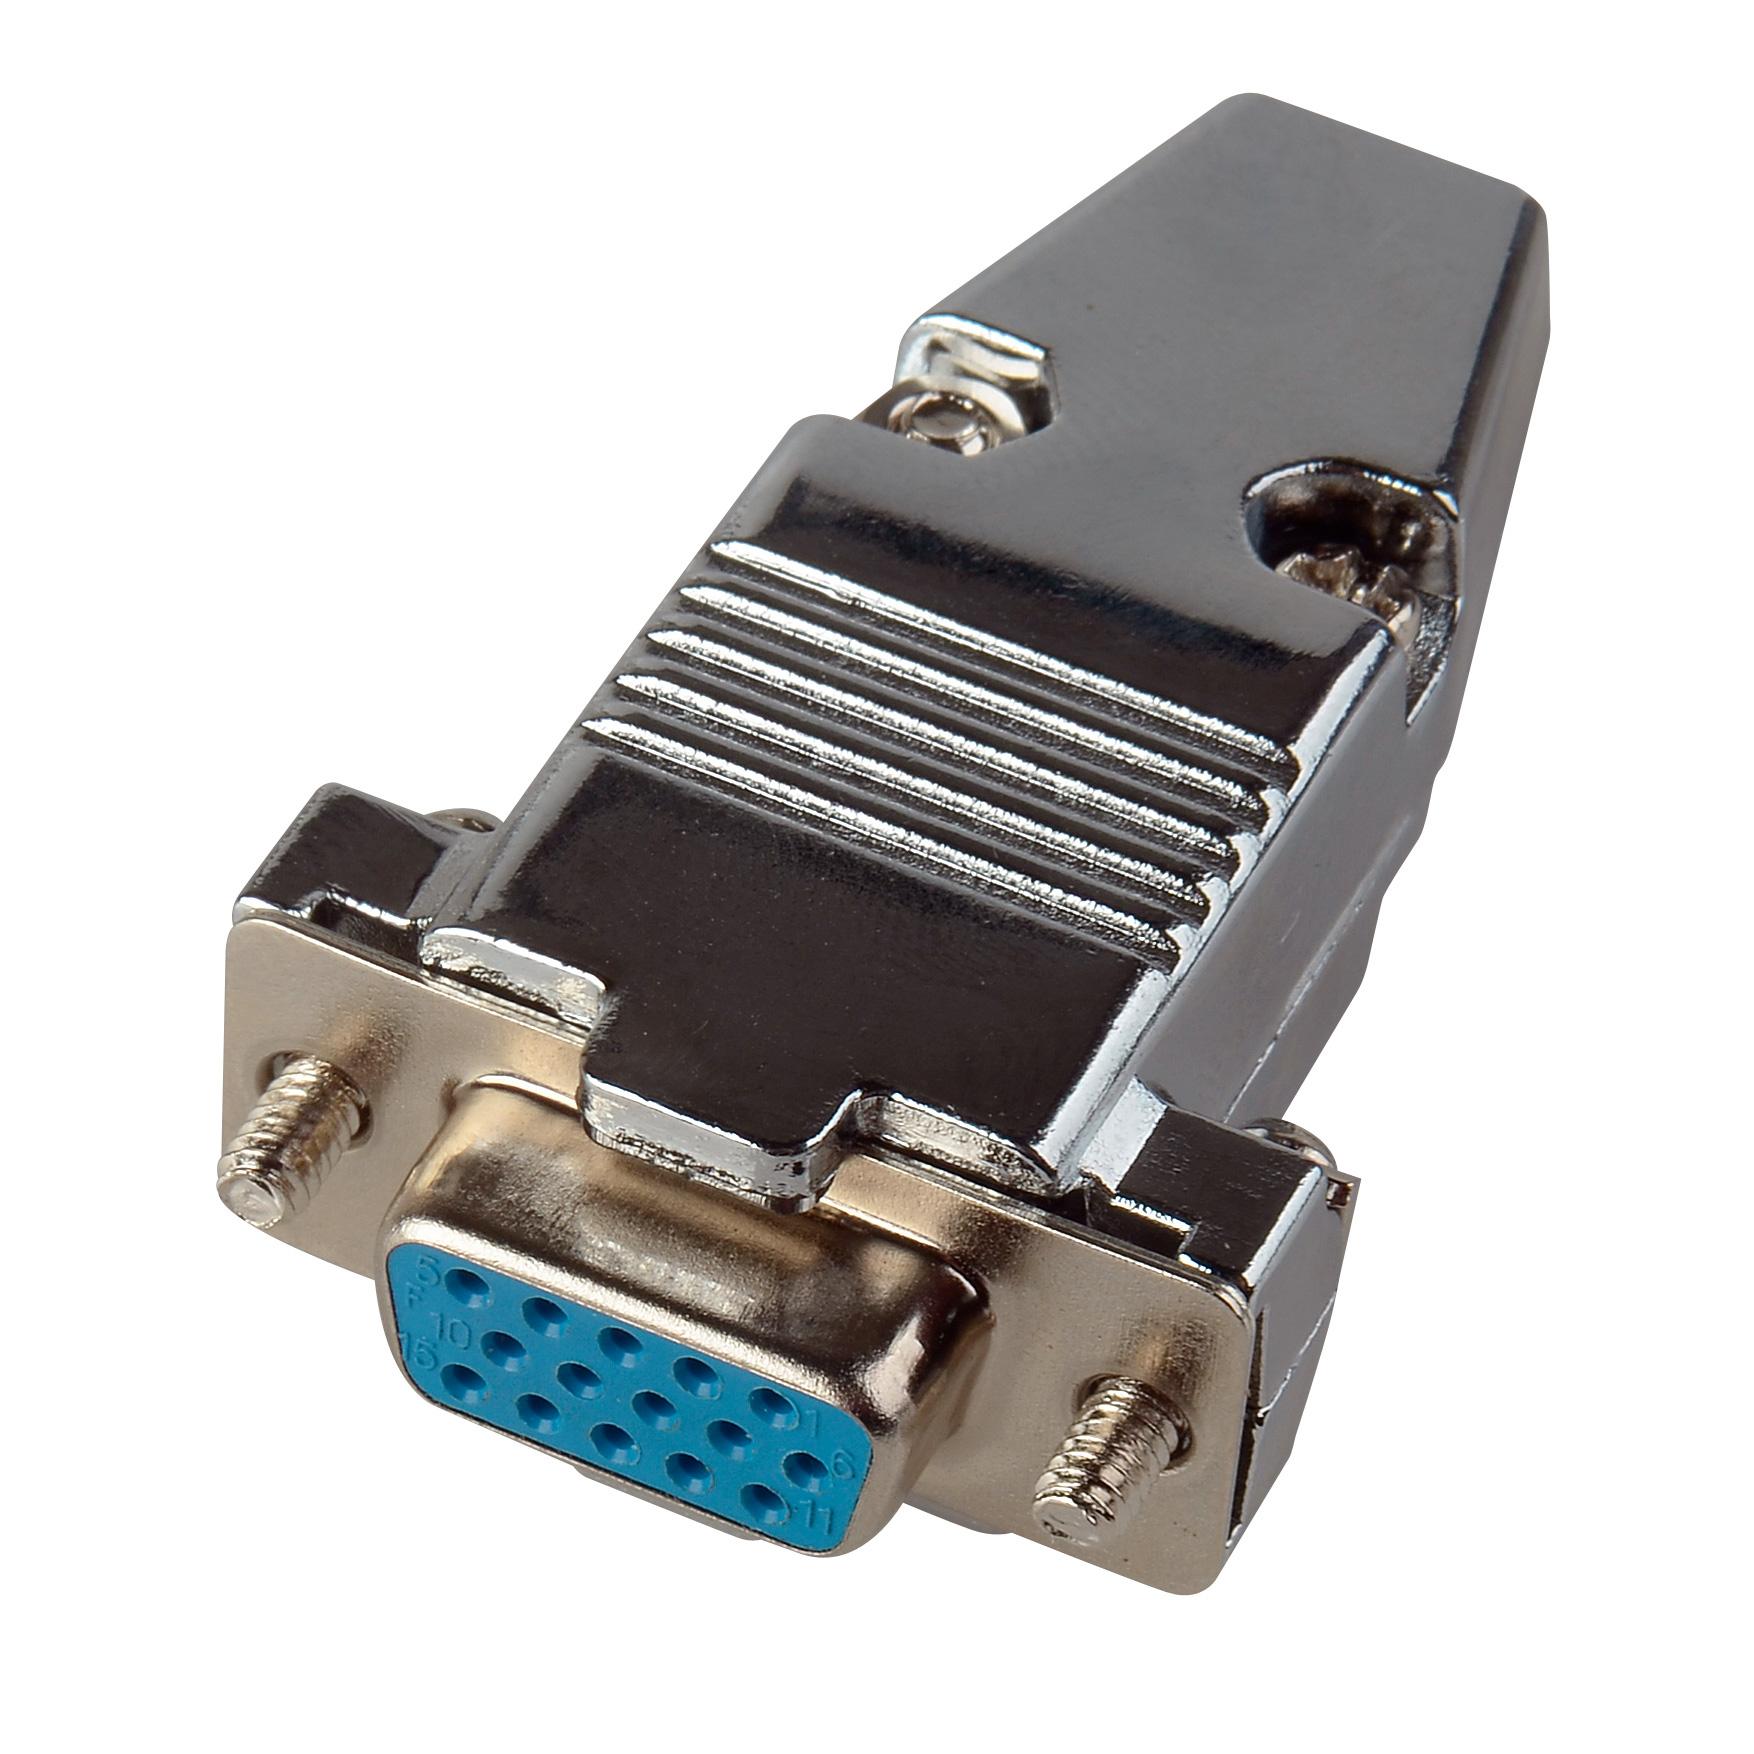 Pin d sub male connector pinout wroc awski informator